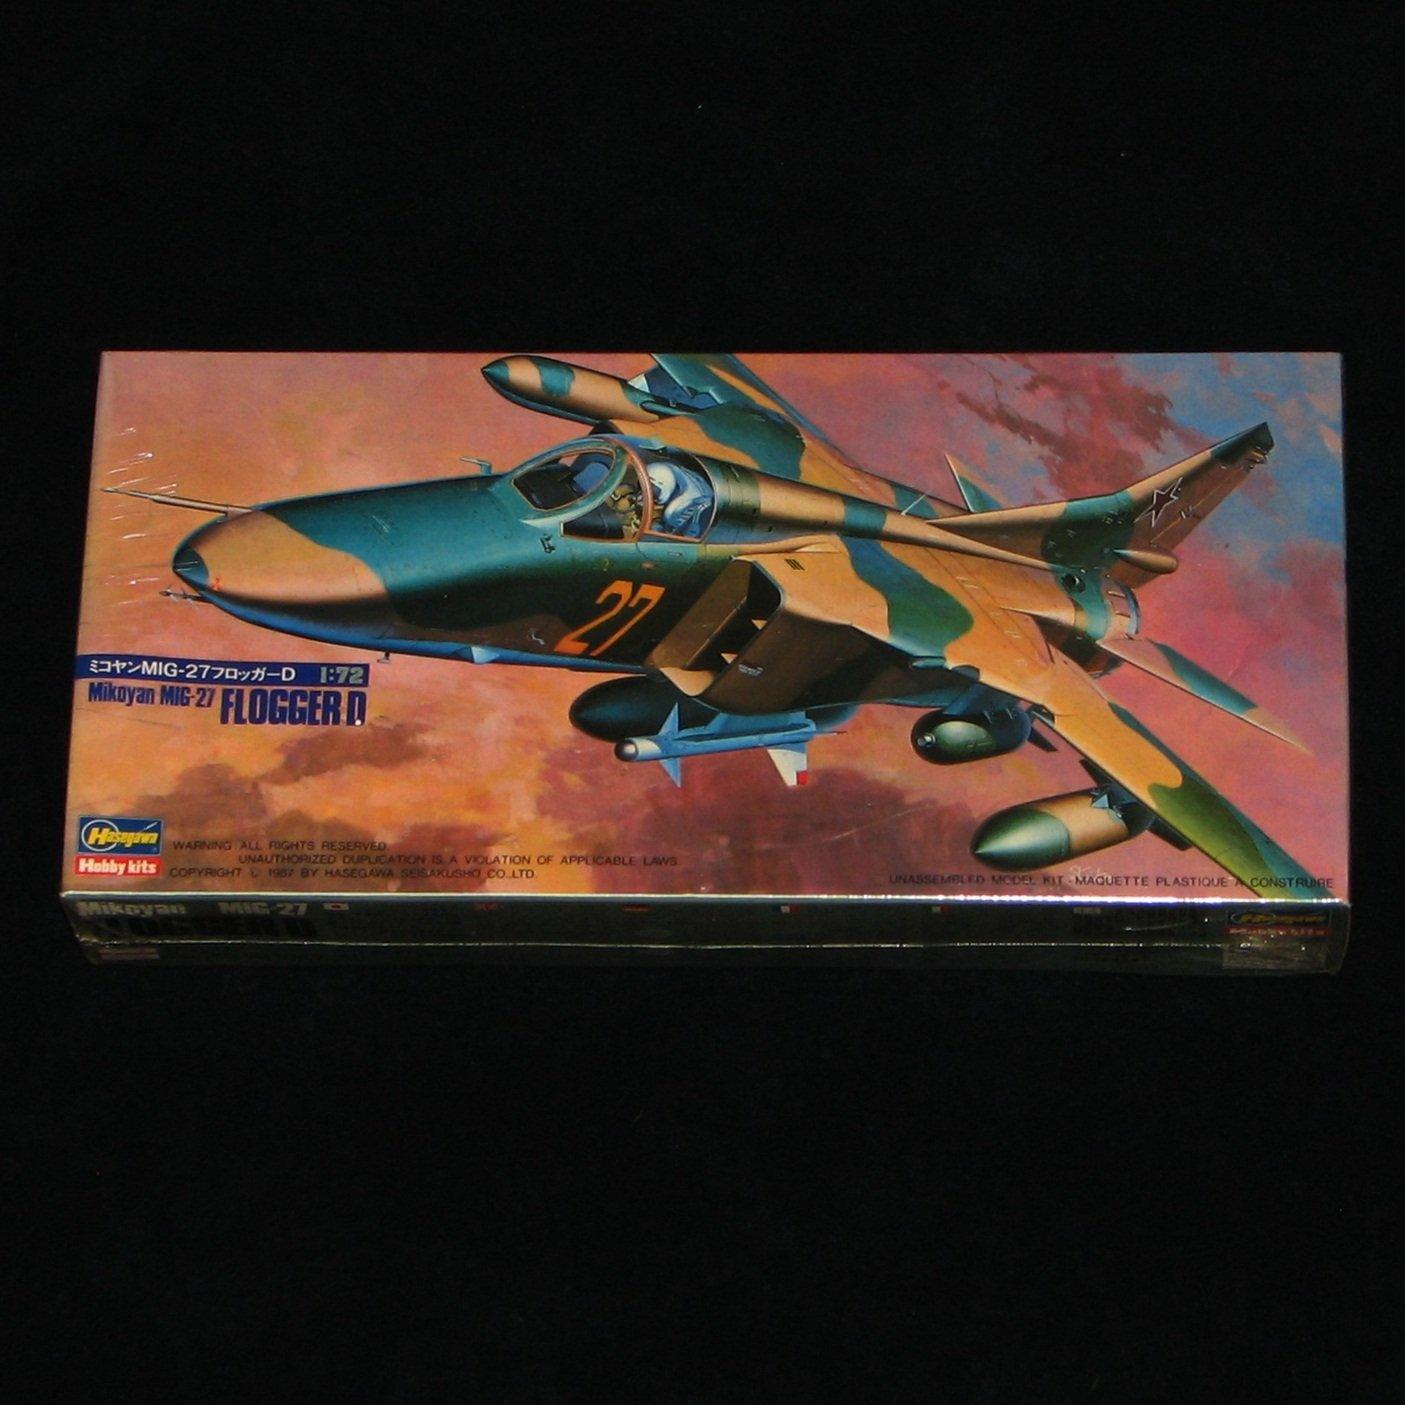 MiG-27 Flogger D Hasegawa 1:72